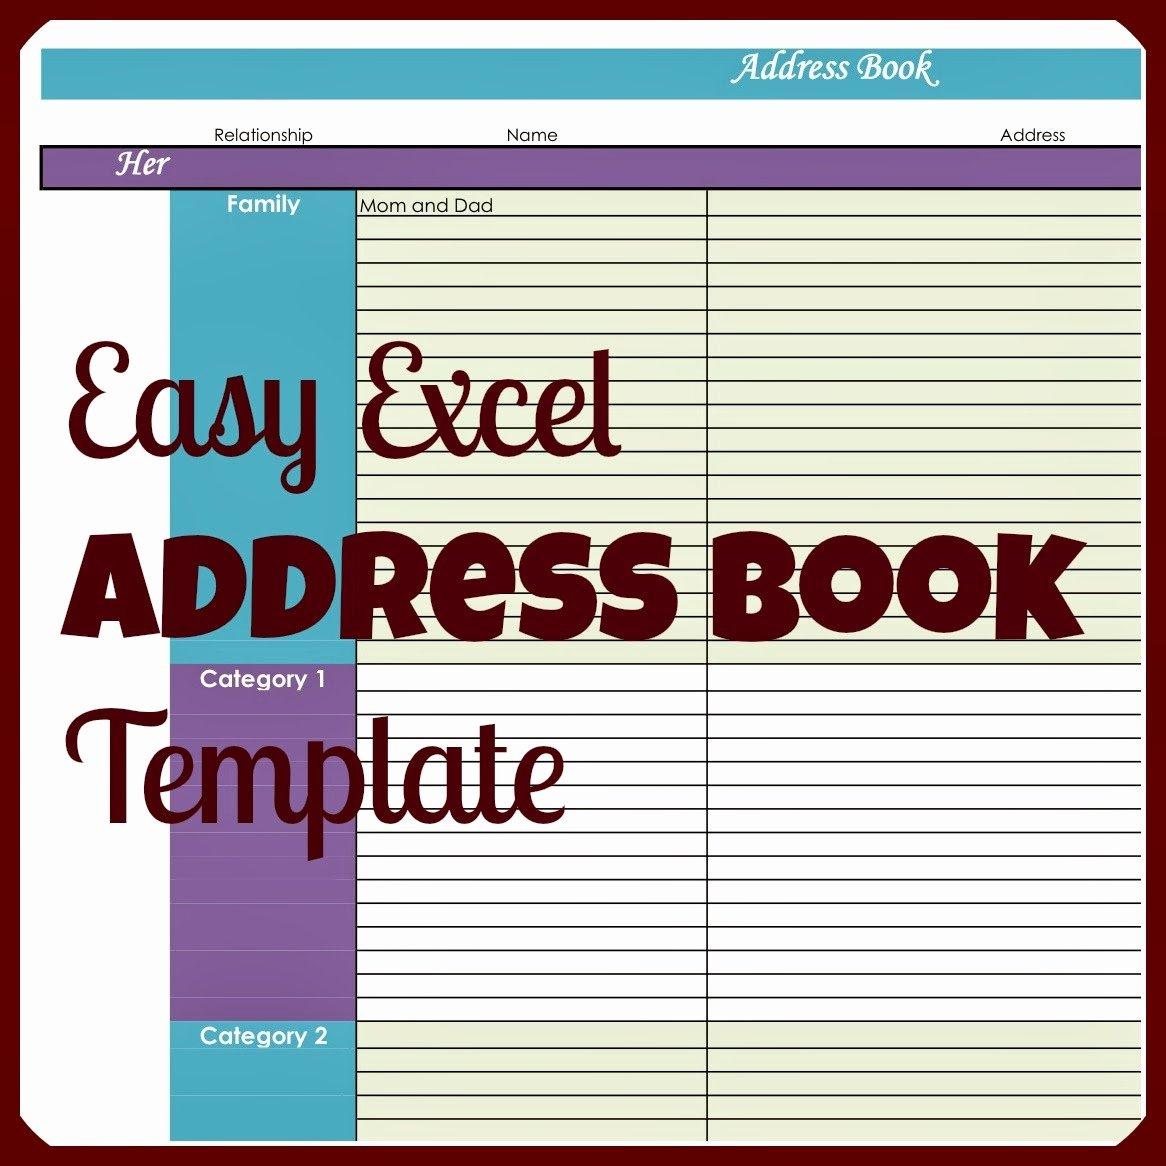 Address Book Template Free Unique Laura S Plans Easy Excel Address Book Template